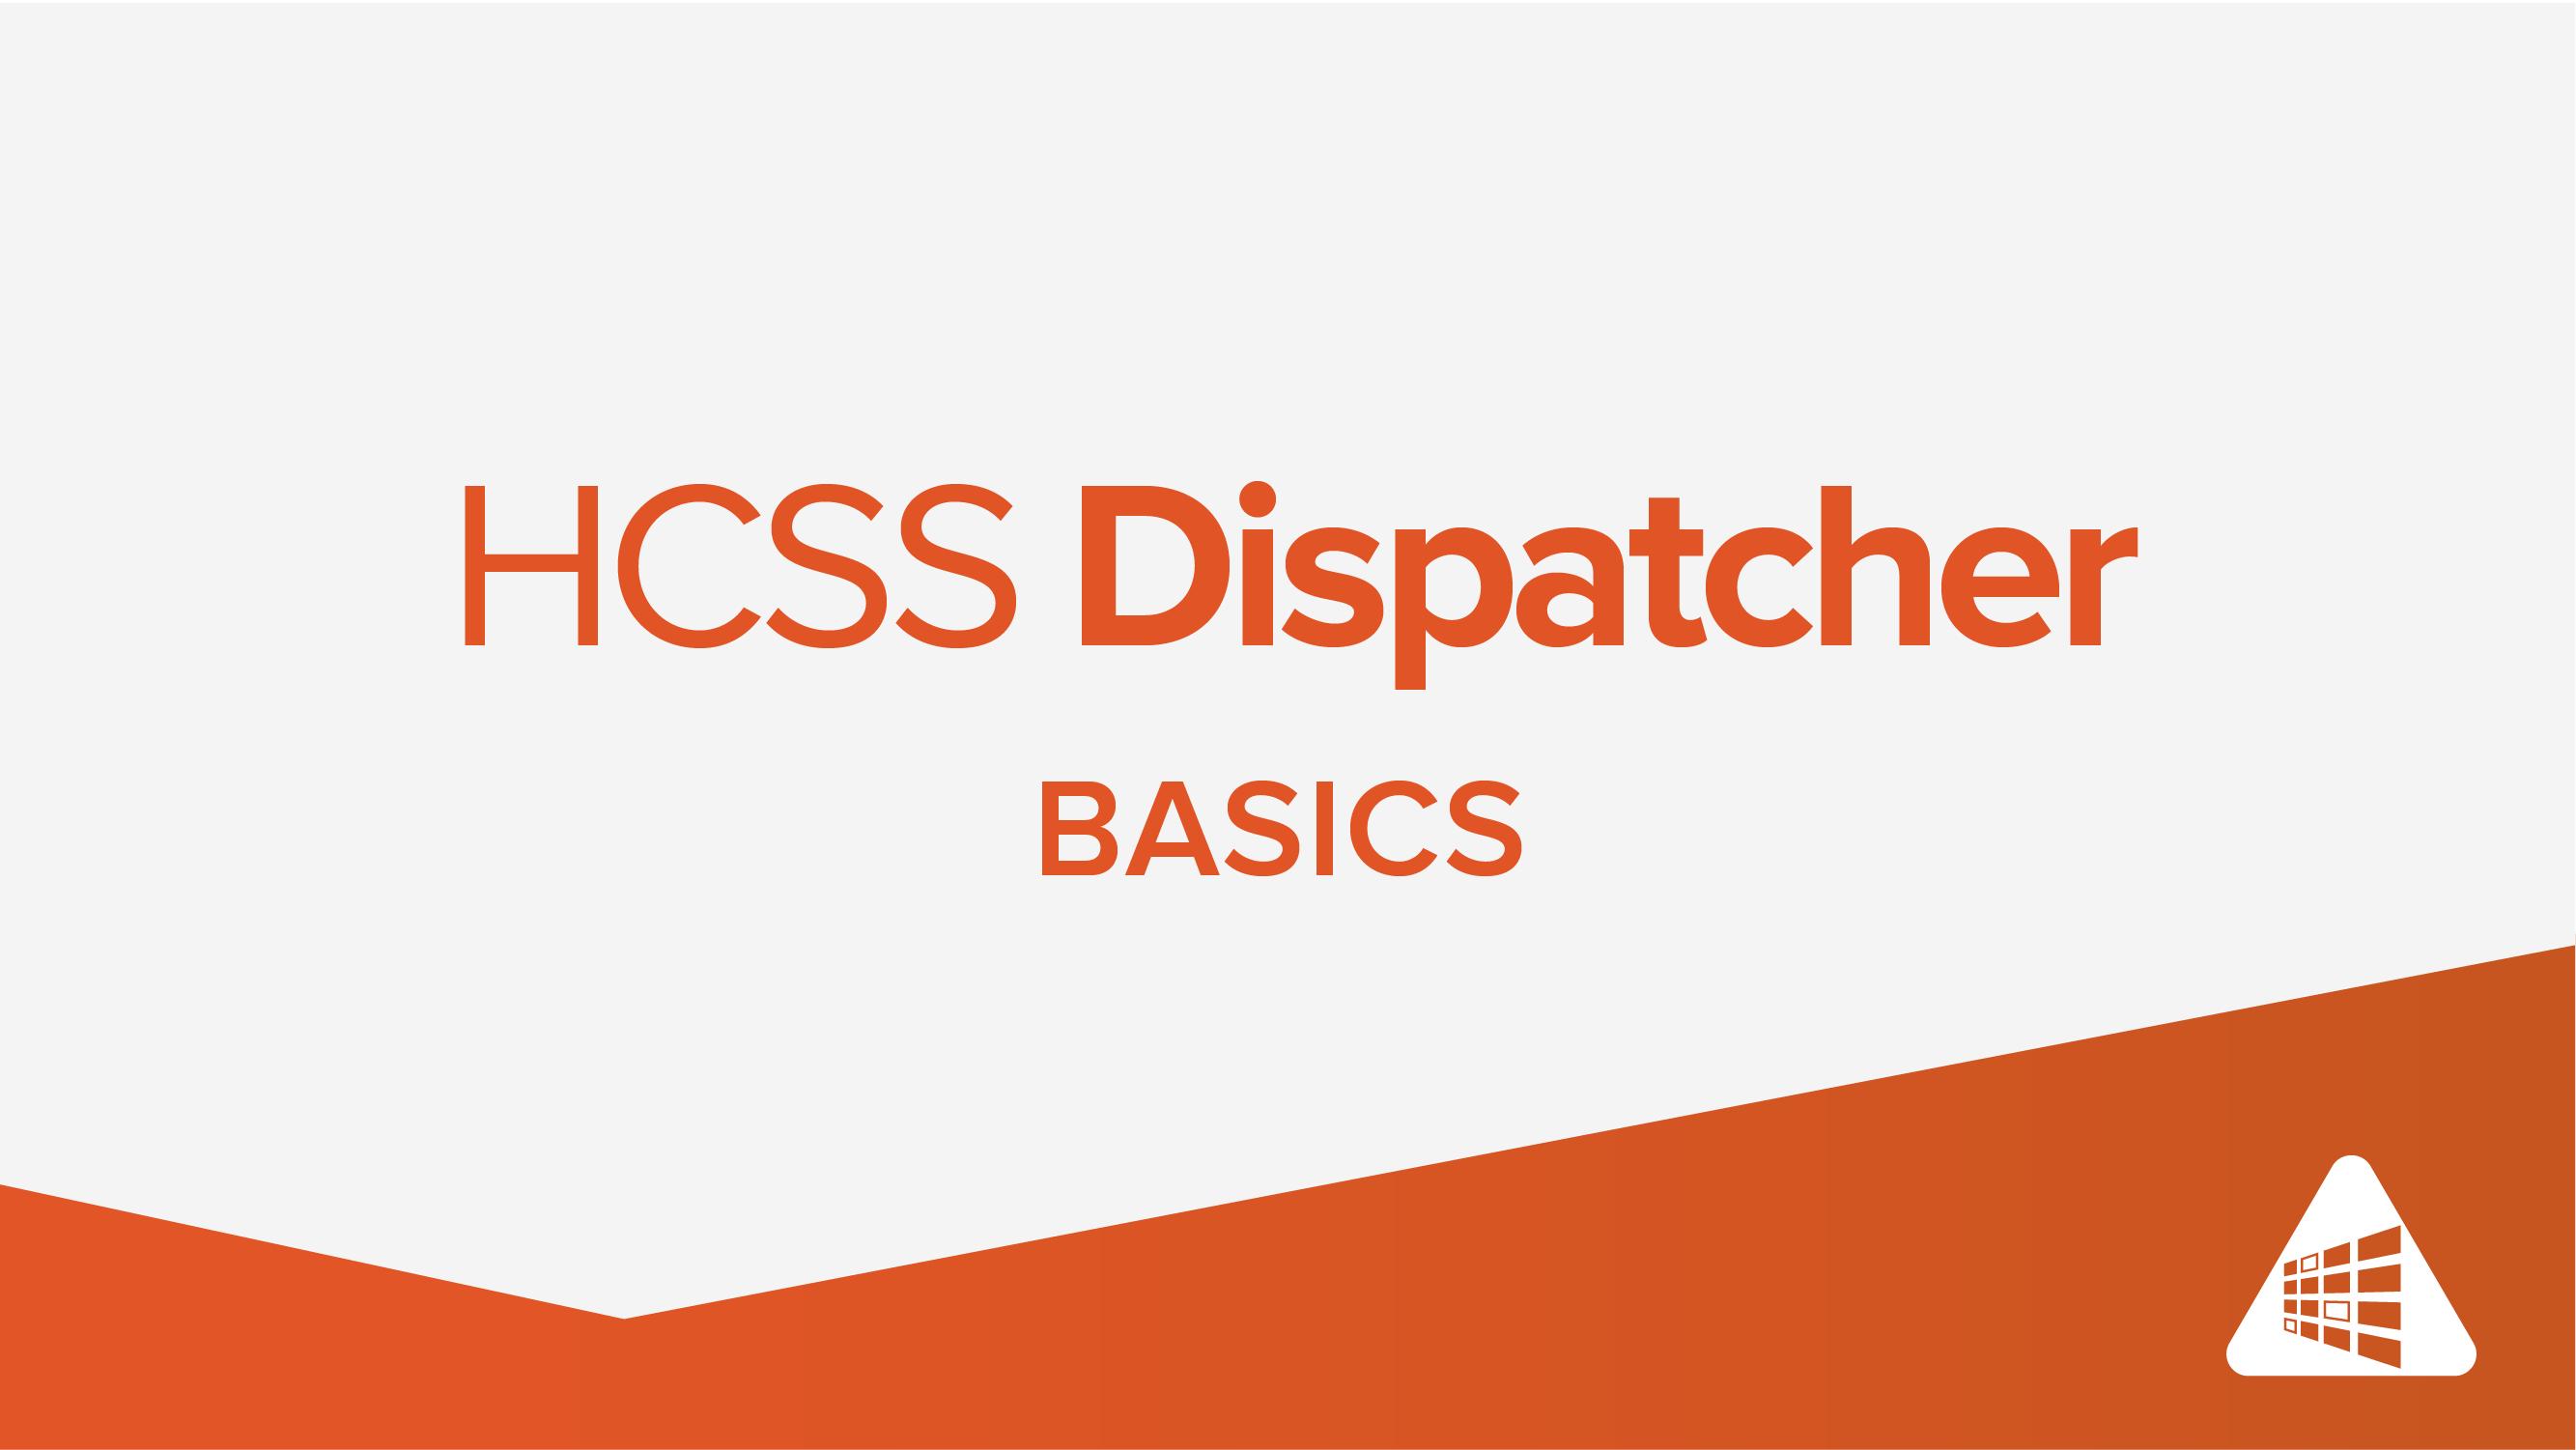 Introduction to HCSS Dispatcher